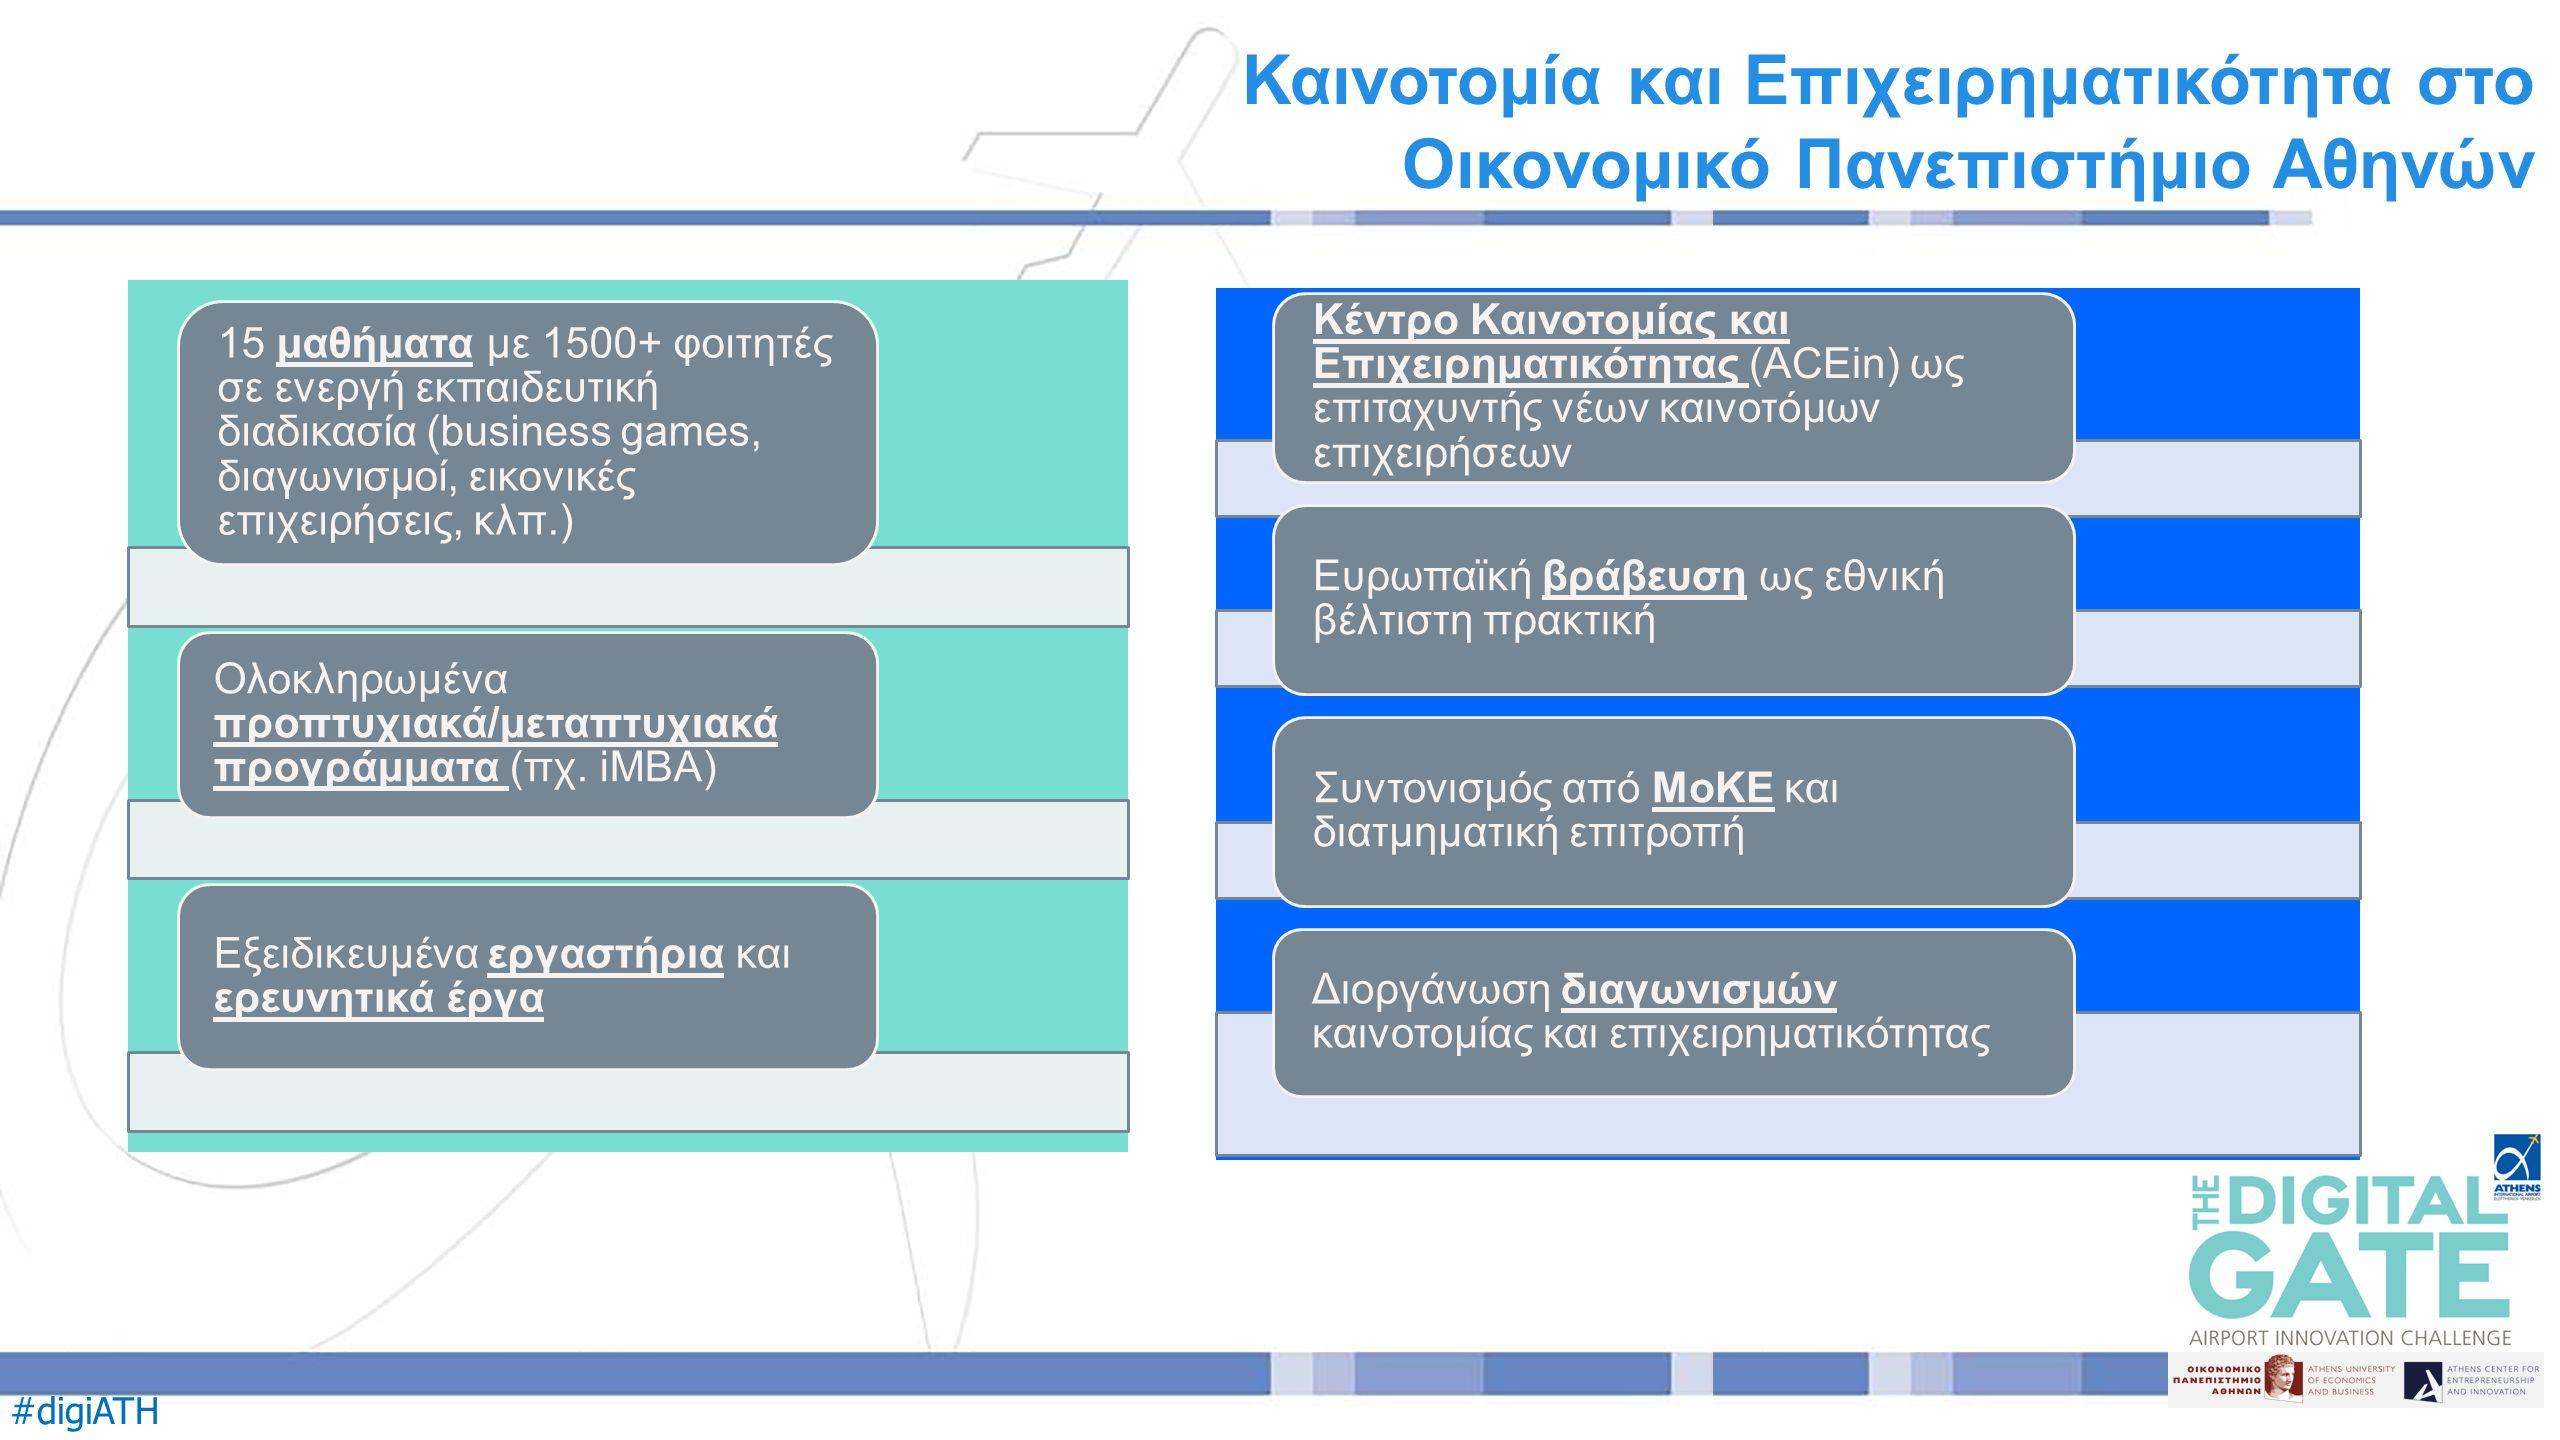 #digiATH Καινοτομία και Επιχειρηματικότητα στο Οικονομικό Πανεπιστήμιο Αθηνών 15 μαθήματα με 1500+ φοιτητές σε ενεργή εκπαιδευτική διαδικασία (business games, διαγωνισμοί, εικονικές επιχειρήσεις, κλπ.) Ολοκληρωμένα προπτυχιακά/μεταπτυχιακά προγράμματα (πχ.